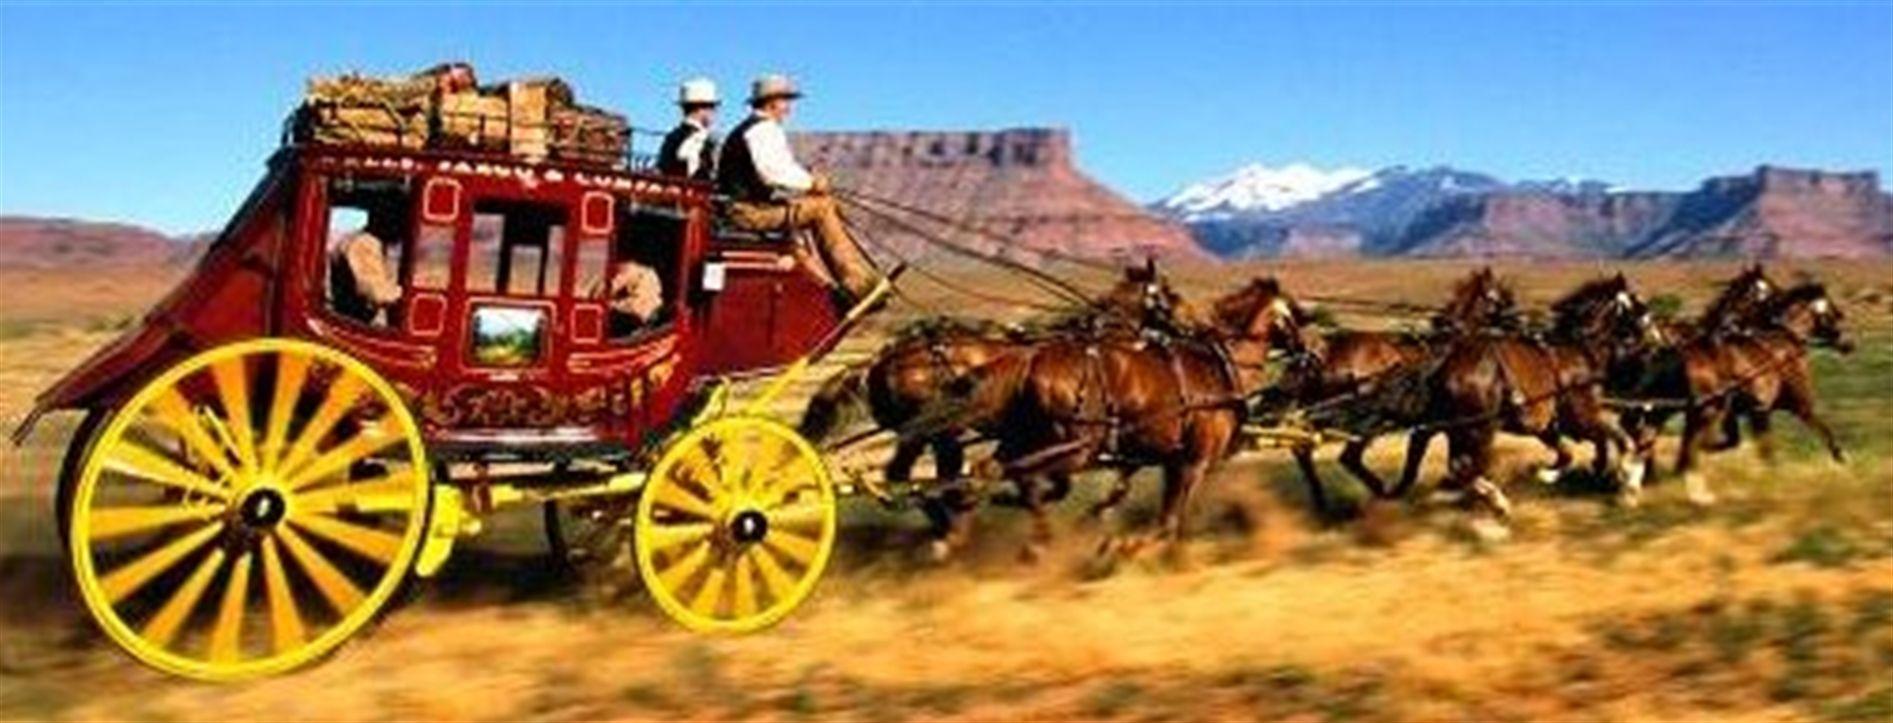 wells-fargo-stagecoach21.jpg (1893×723) | Schoe | Pinterest